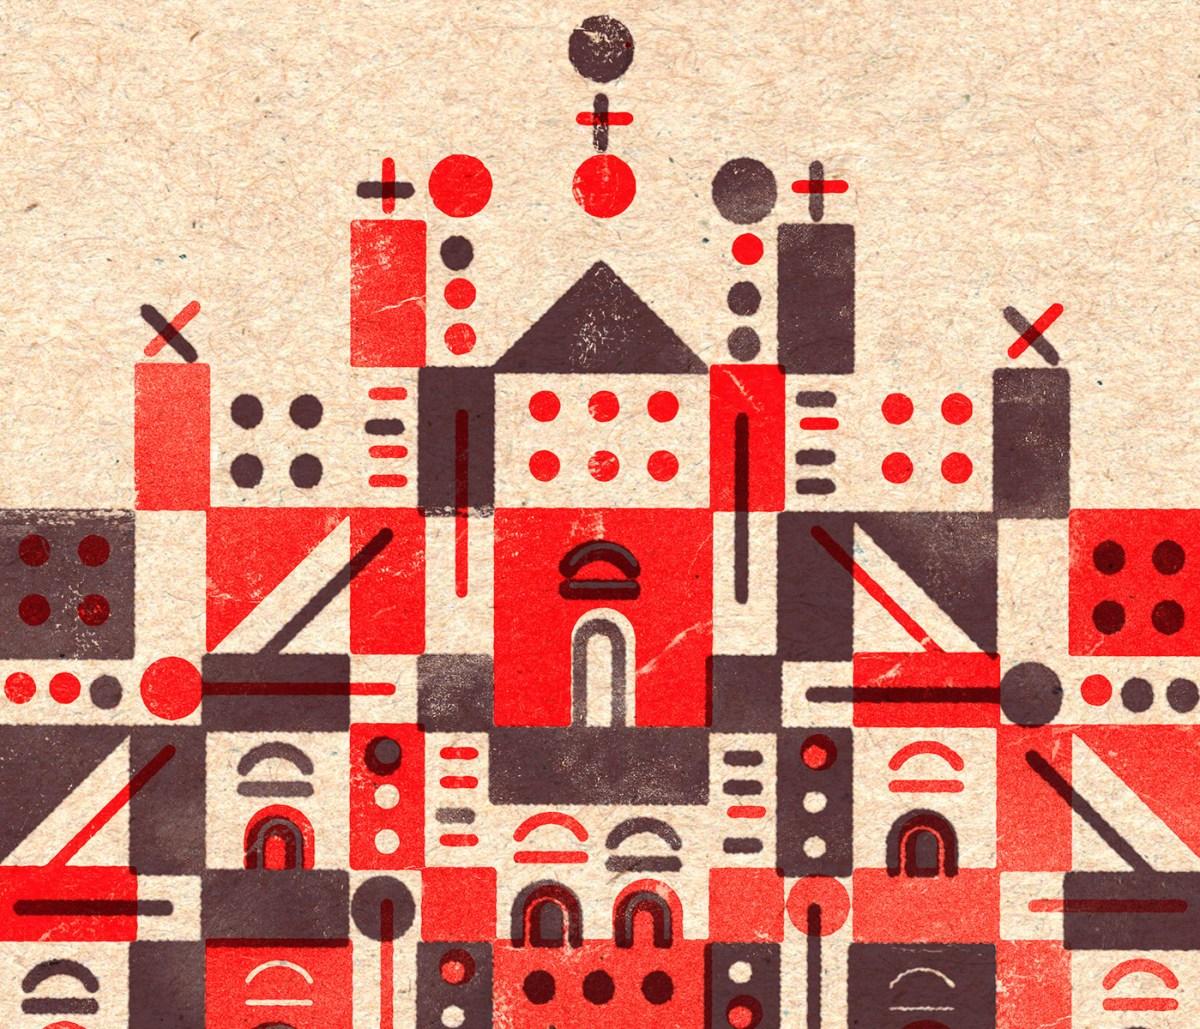 illustration-italy-matchbooks-13